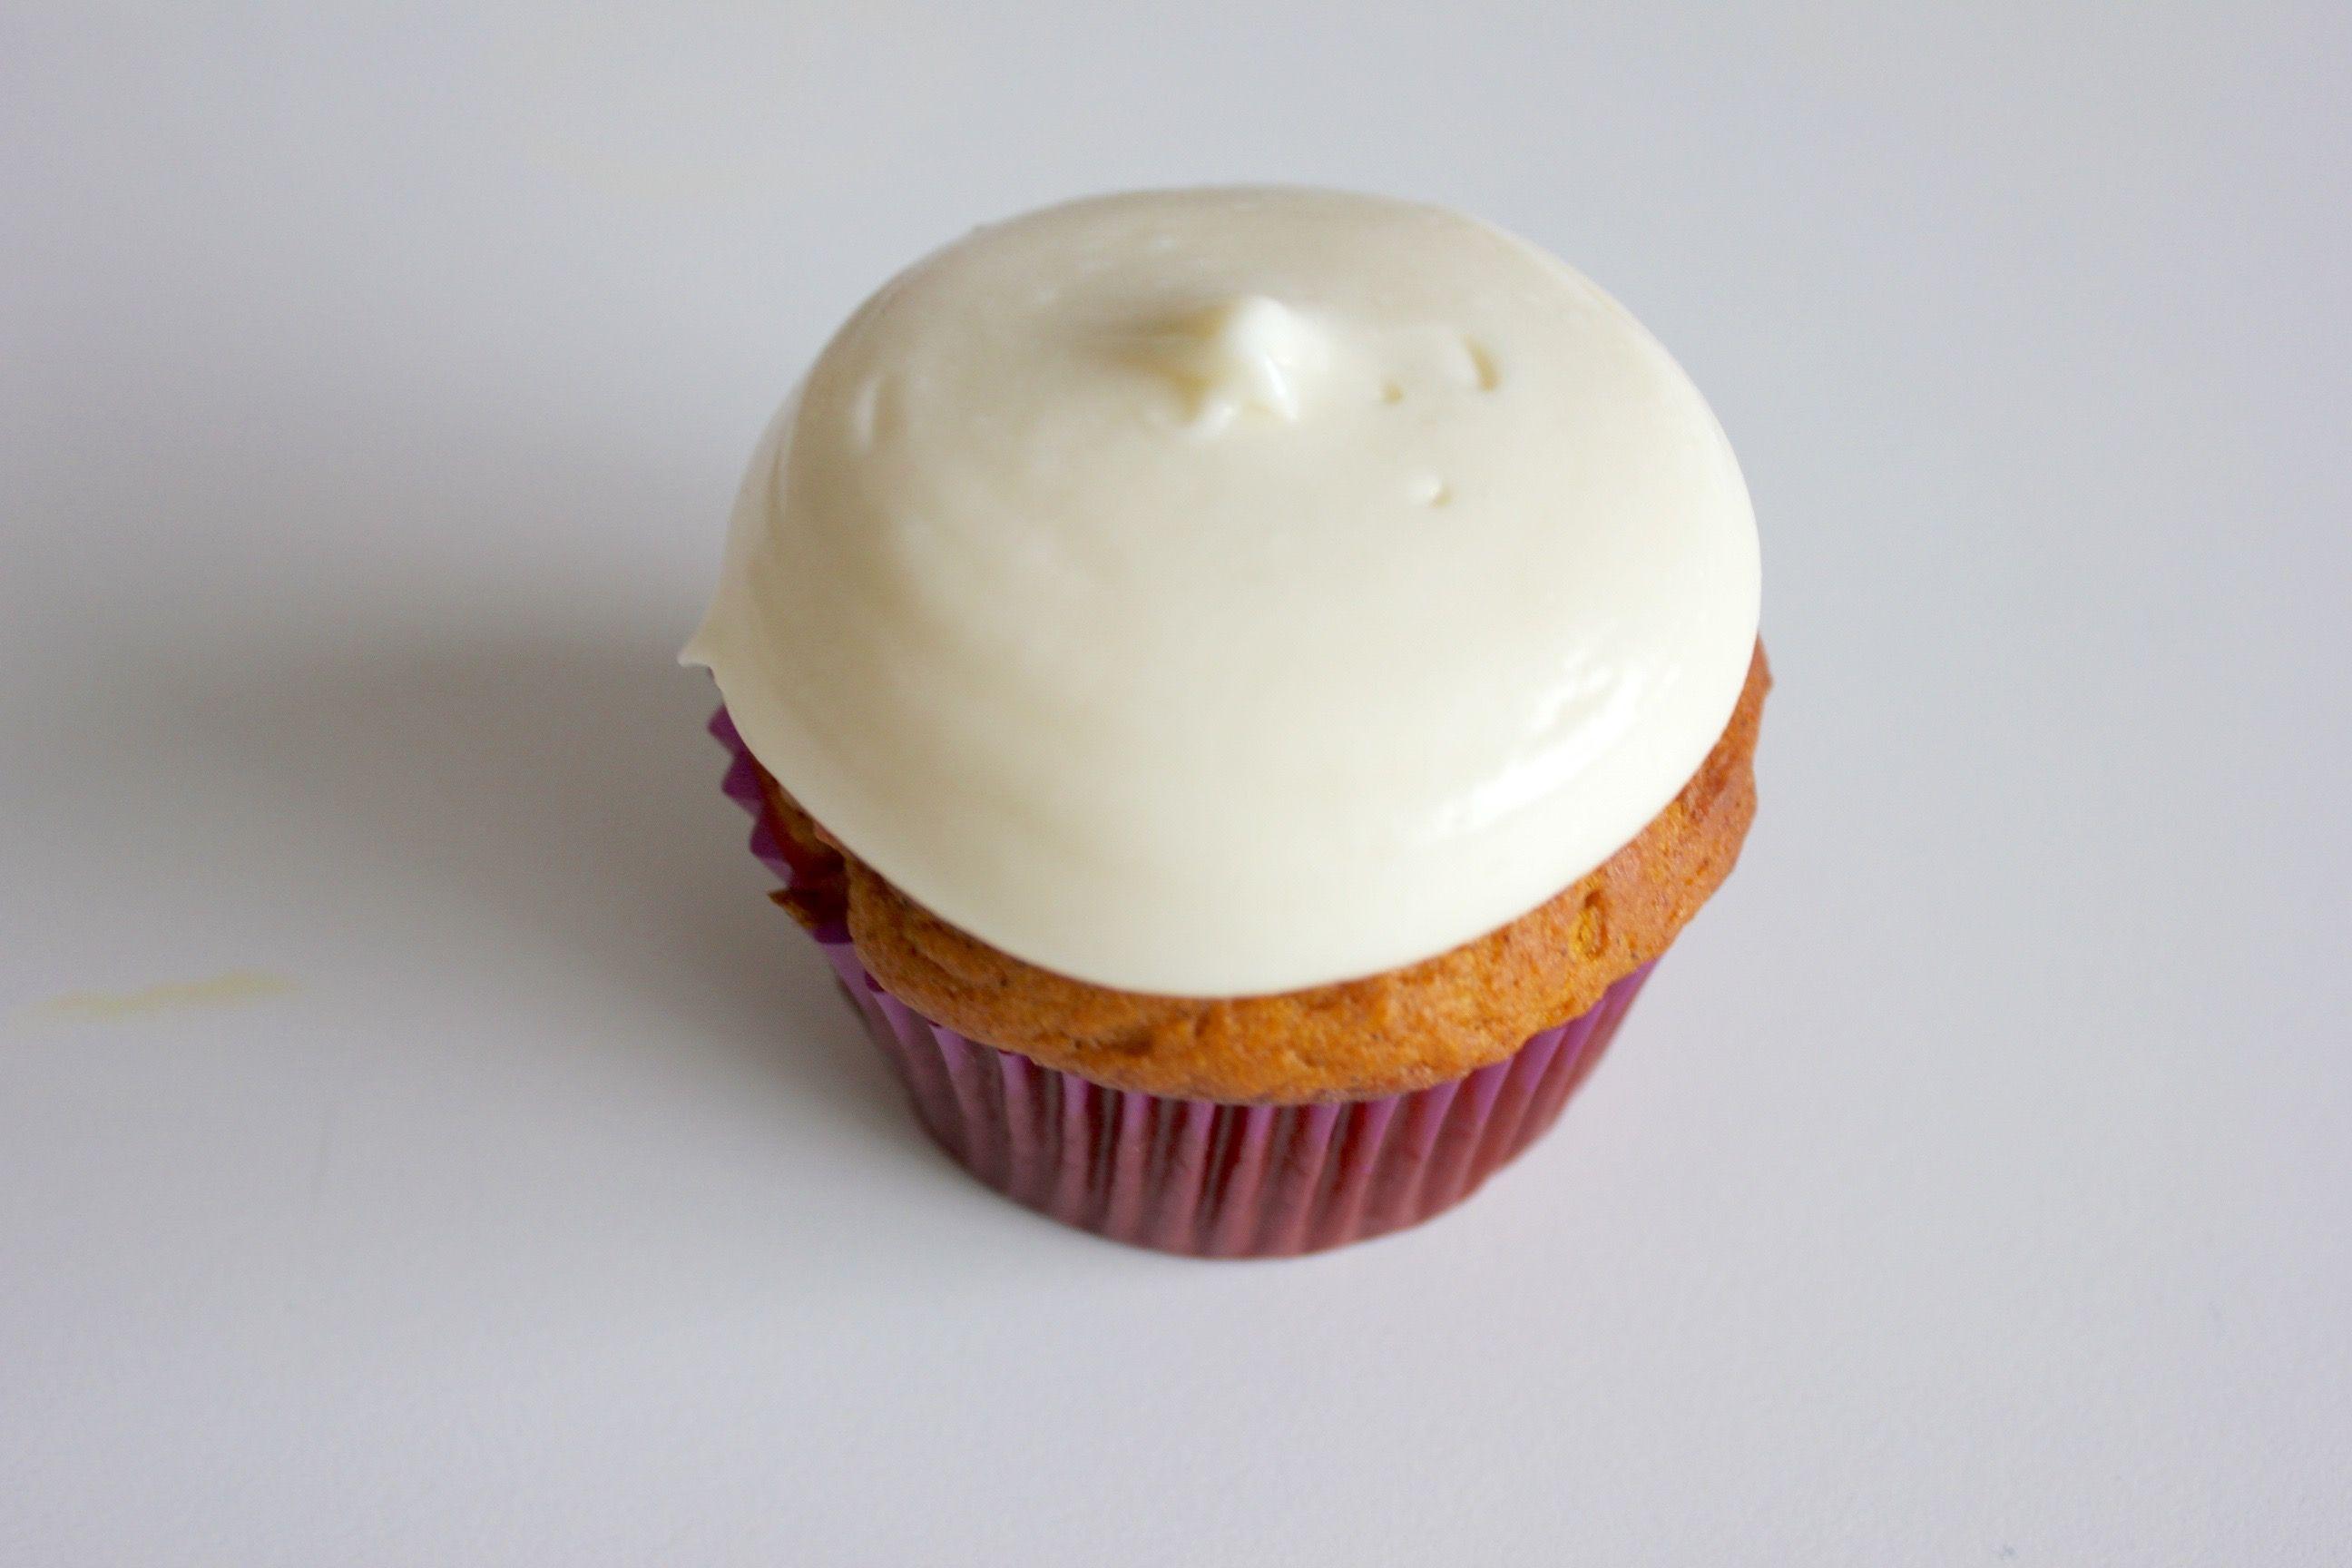 Super simple Pumpkin Spice Cupcake w/ Cream Cheese Frosting